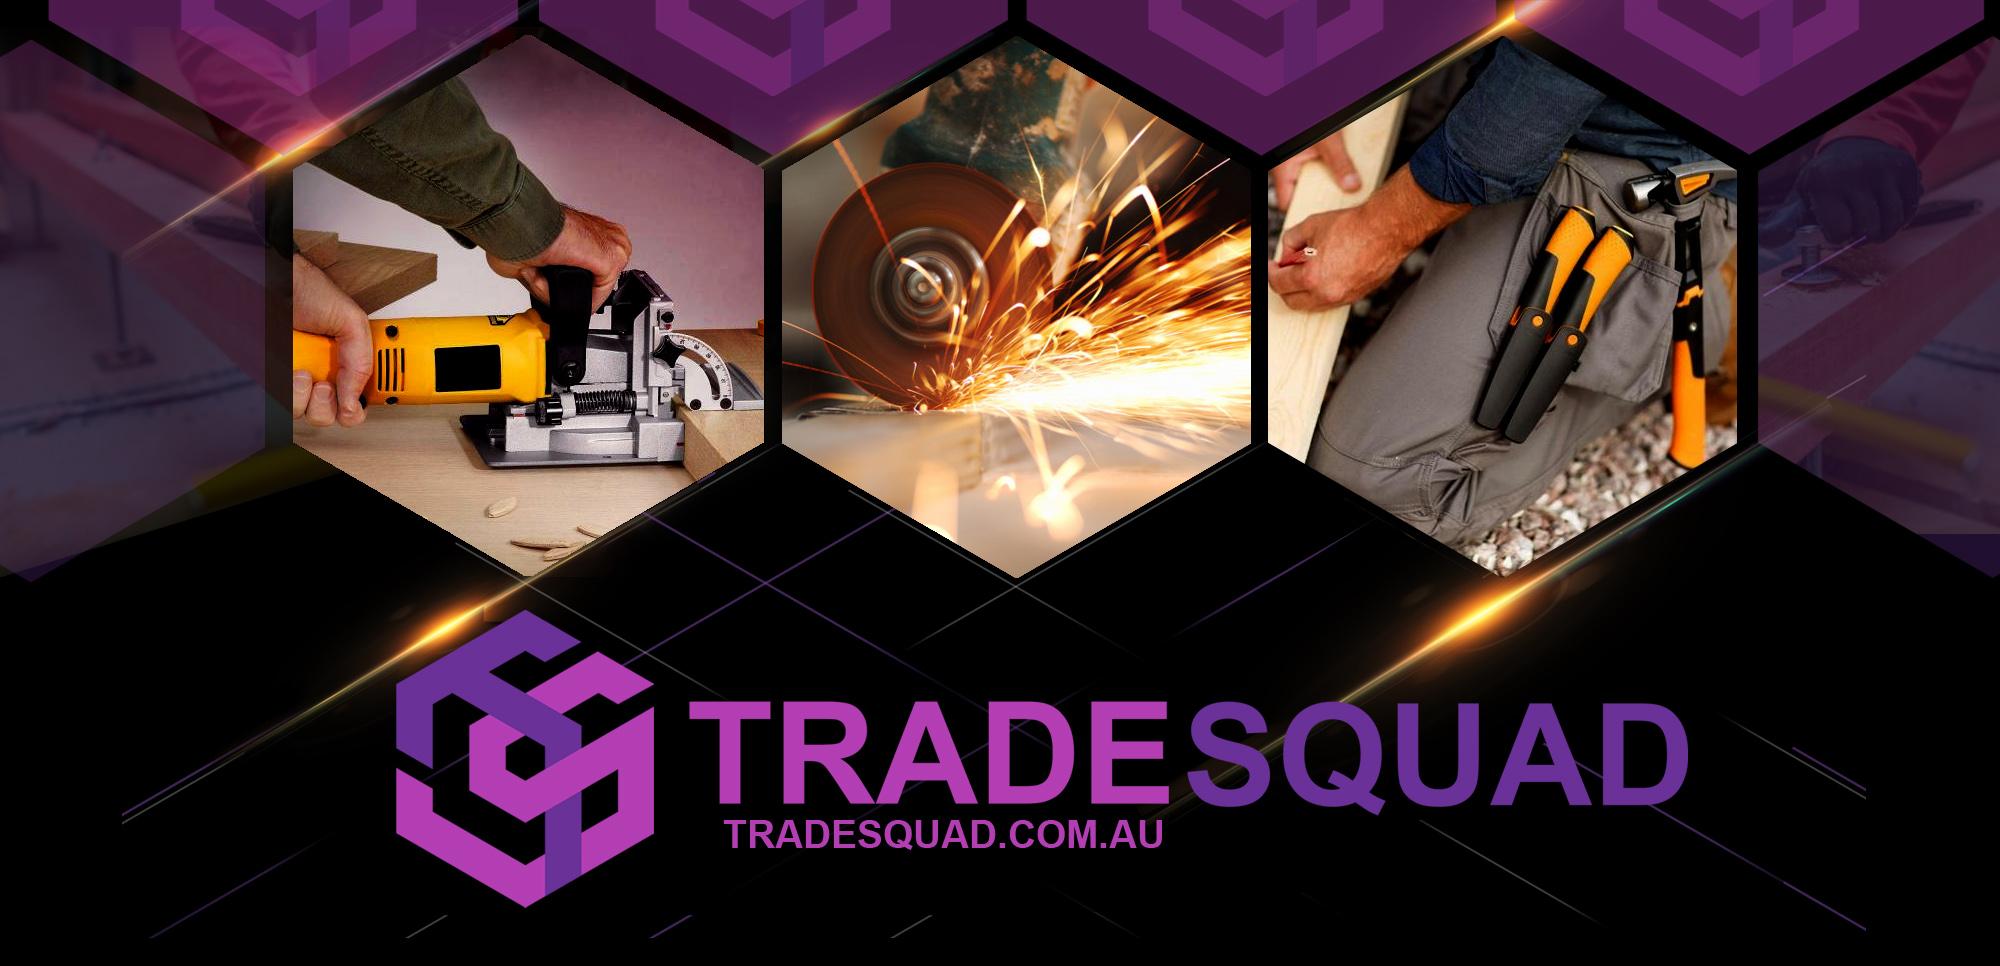 Tradesquad